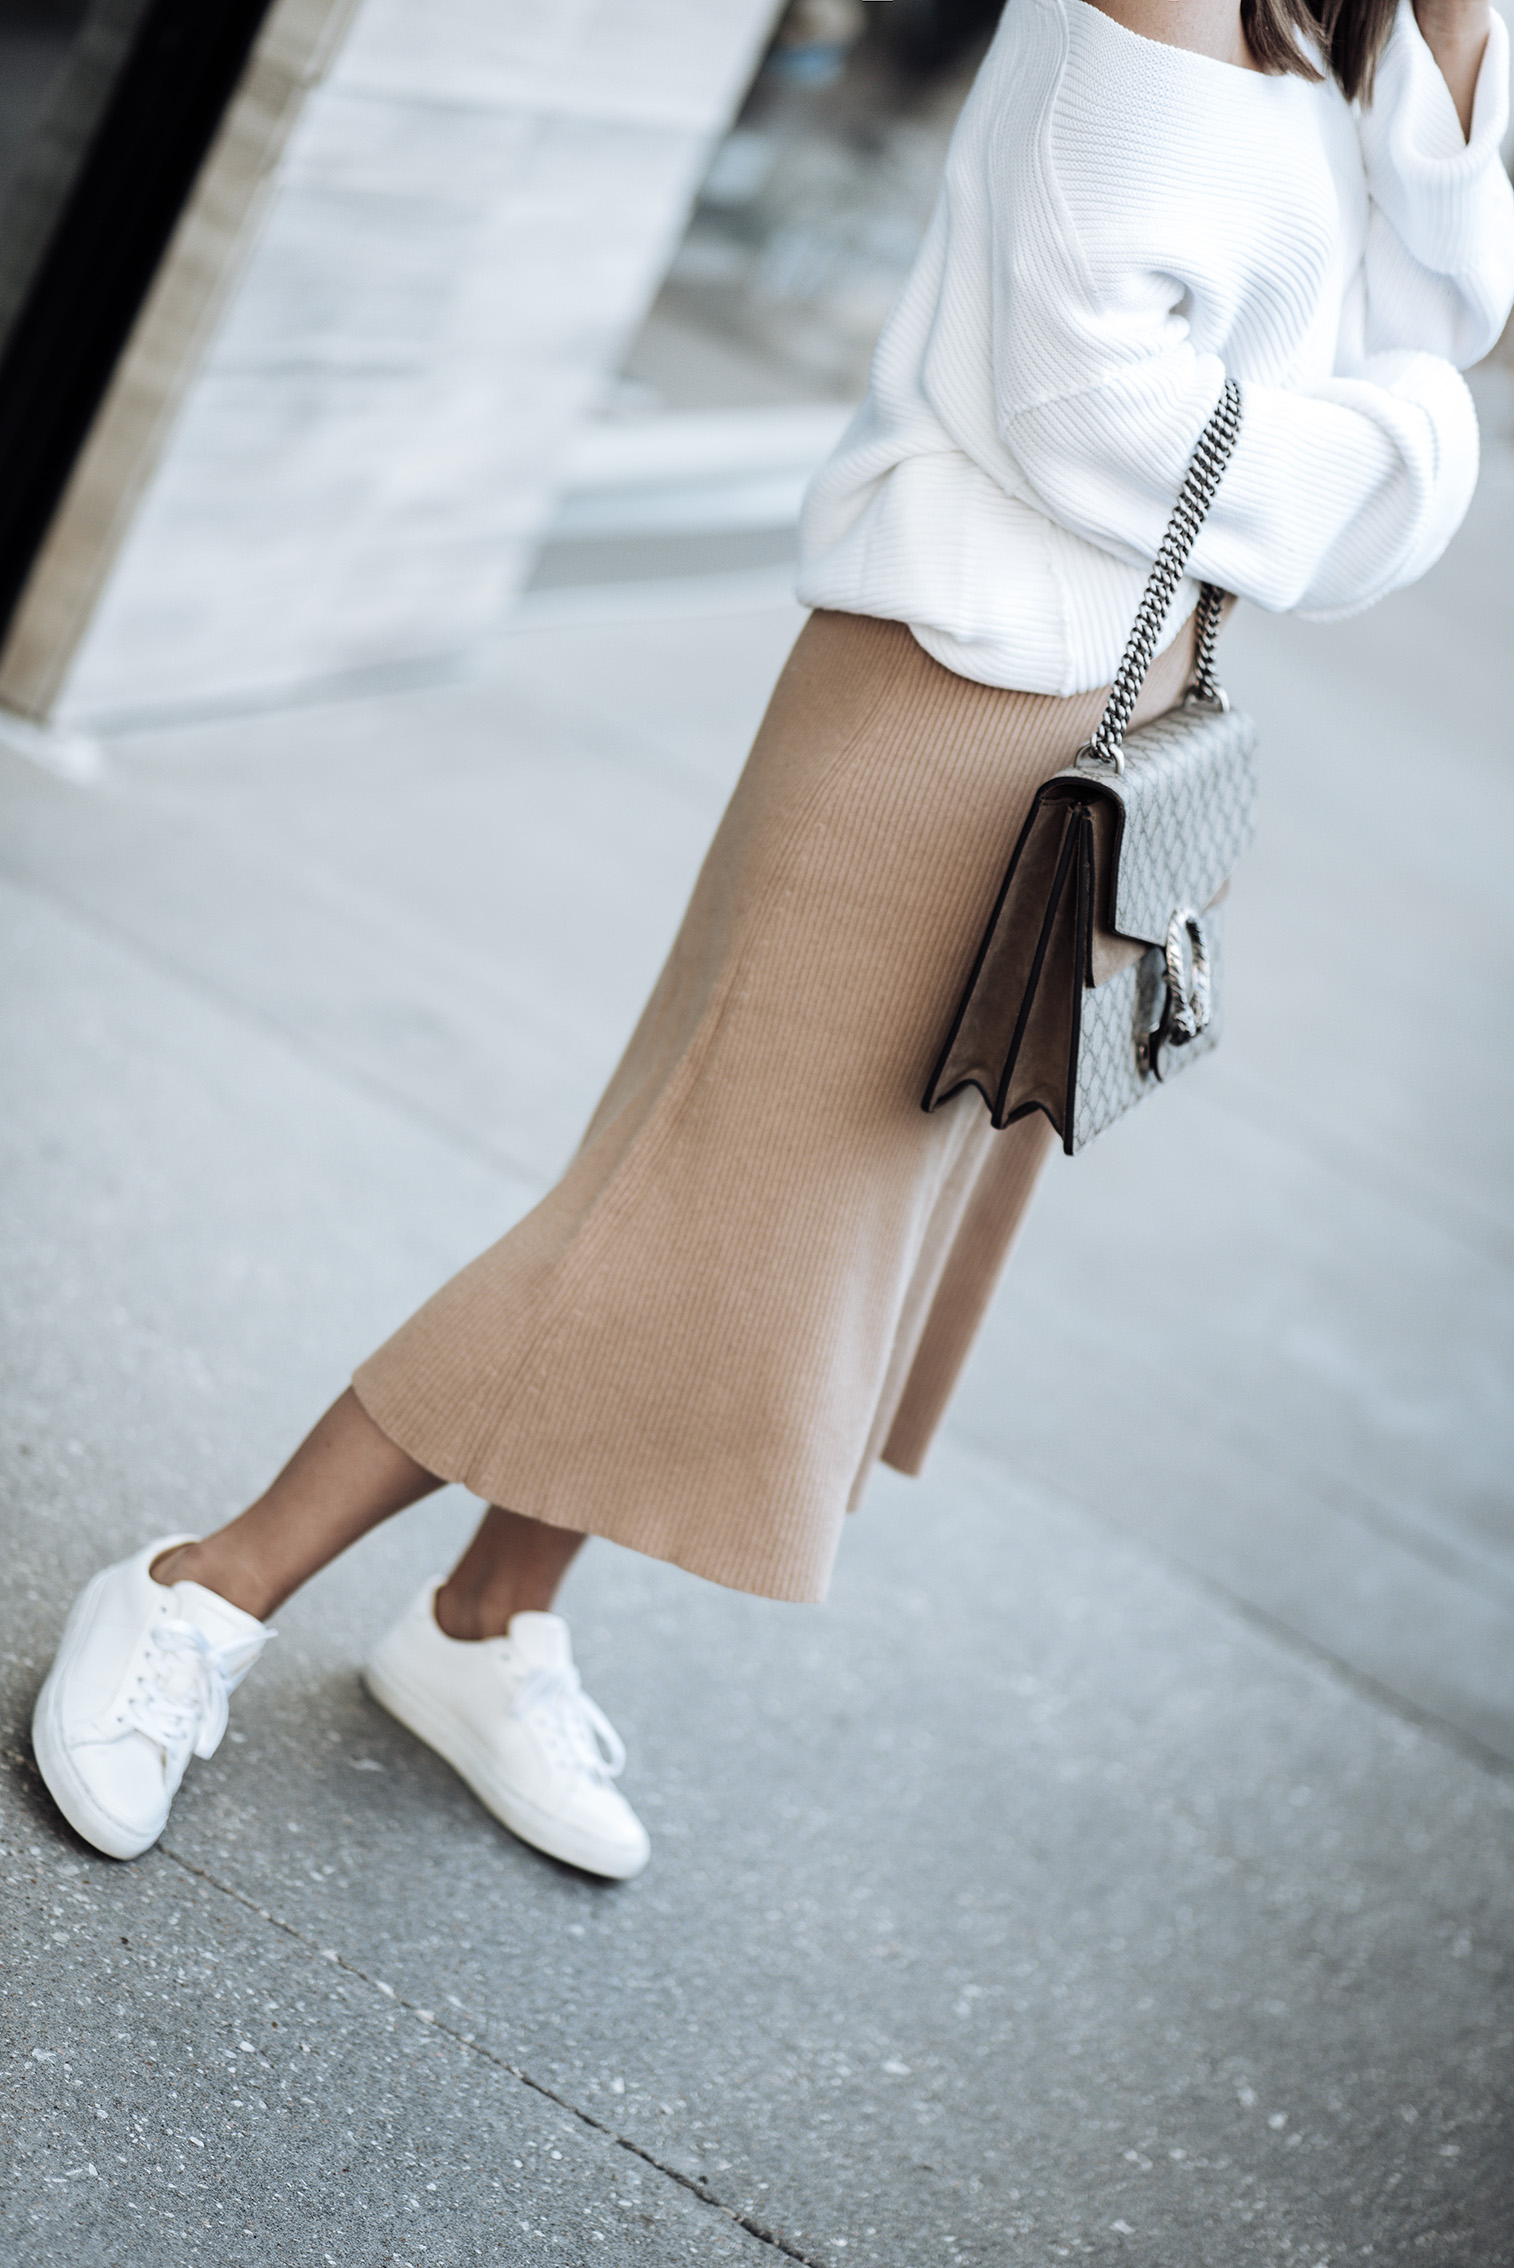 Tiffany Jais fashion and lifestyle blogger of Flaunt and Center | Houston fashion blogger | Cozy Knits | Streetstyle blog |Italian Superloft Midi Sweater Skirt | Free People La Brea Sweater | The Royal sneaker | Large Gucci Dionysus